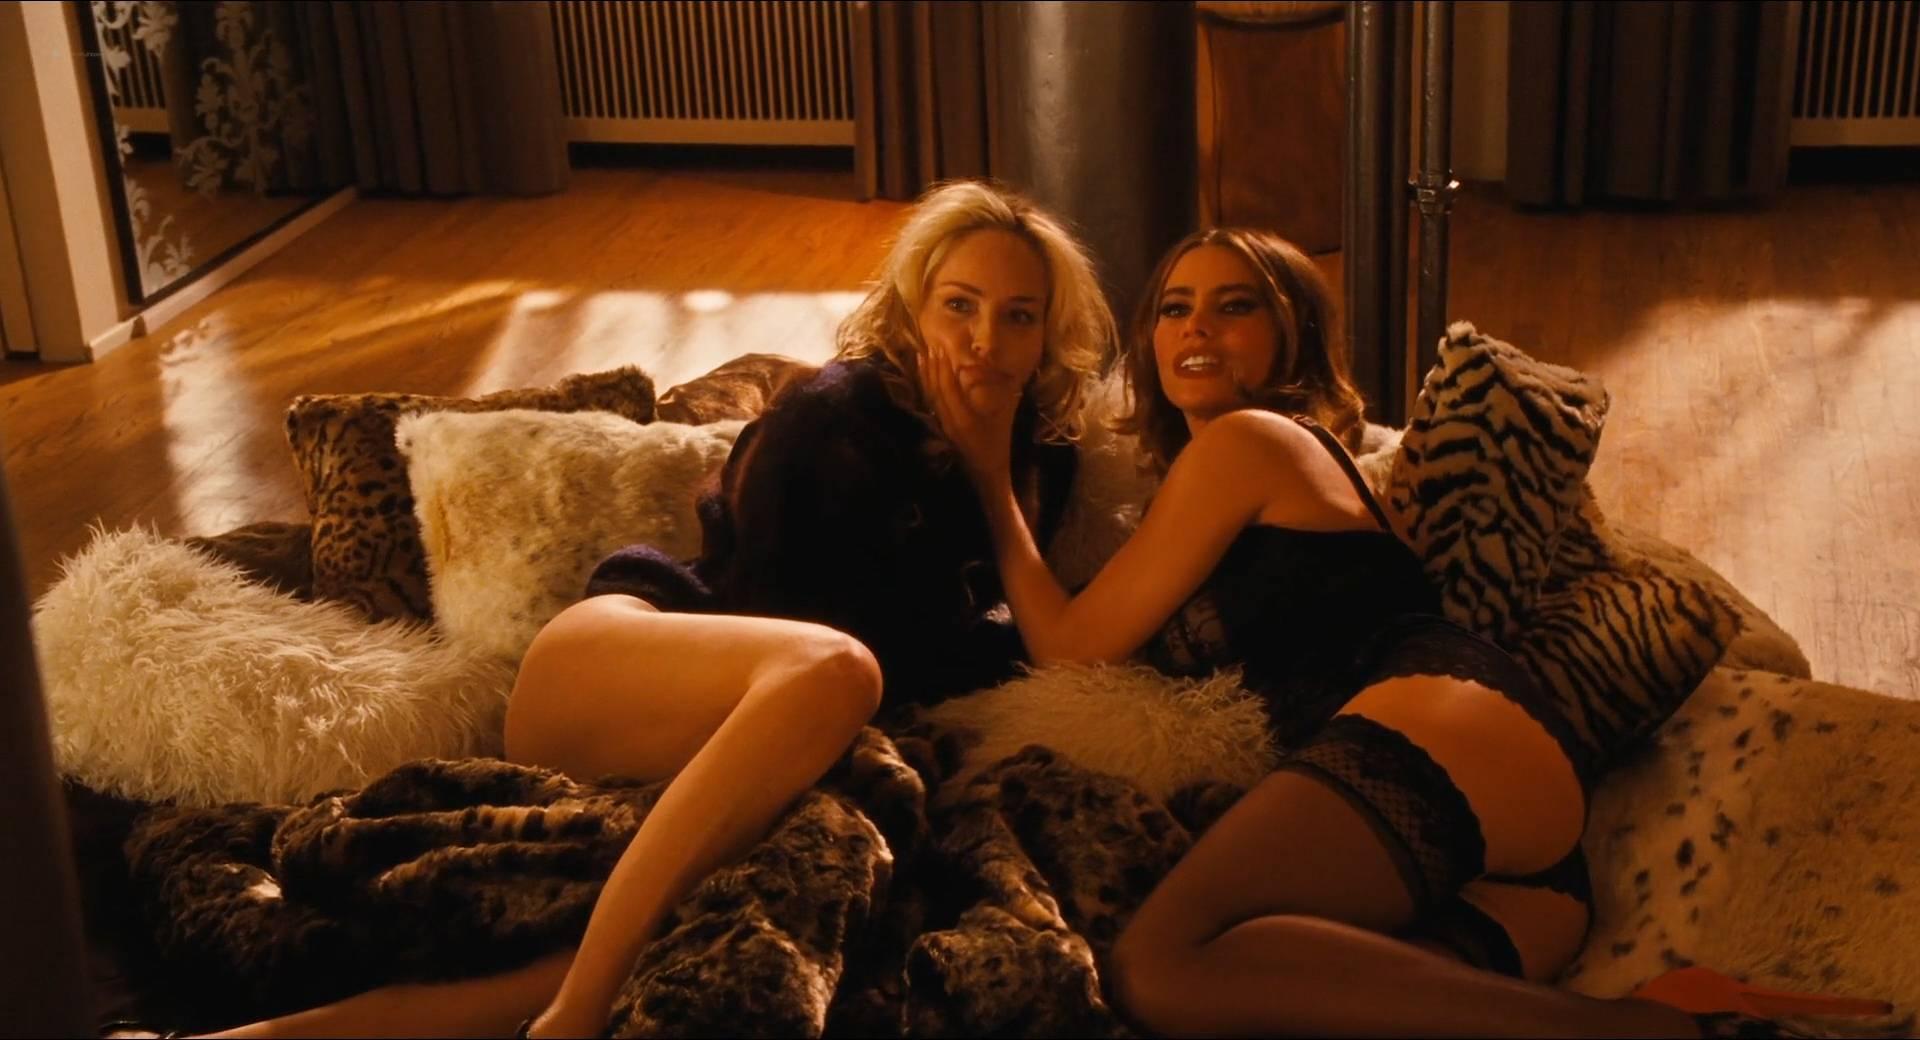 Sharon Stone Nude Topless Sofia Vergara Hot And Sexy-7253